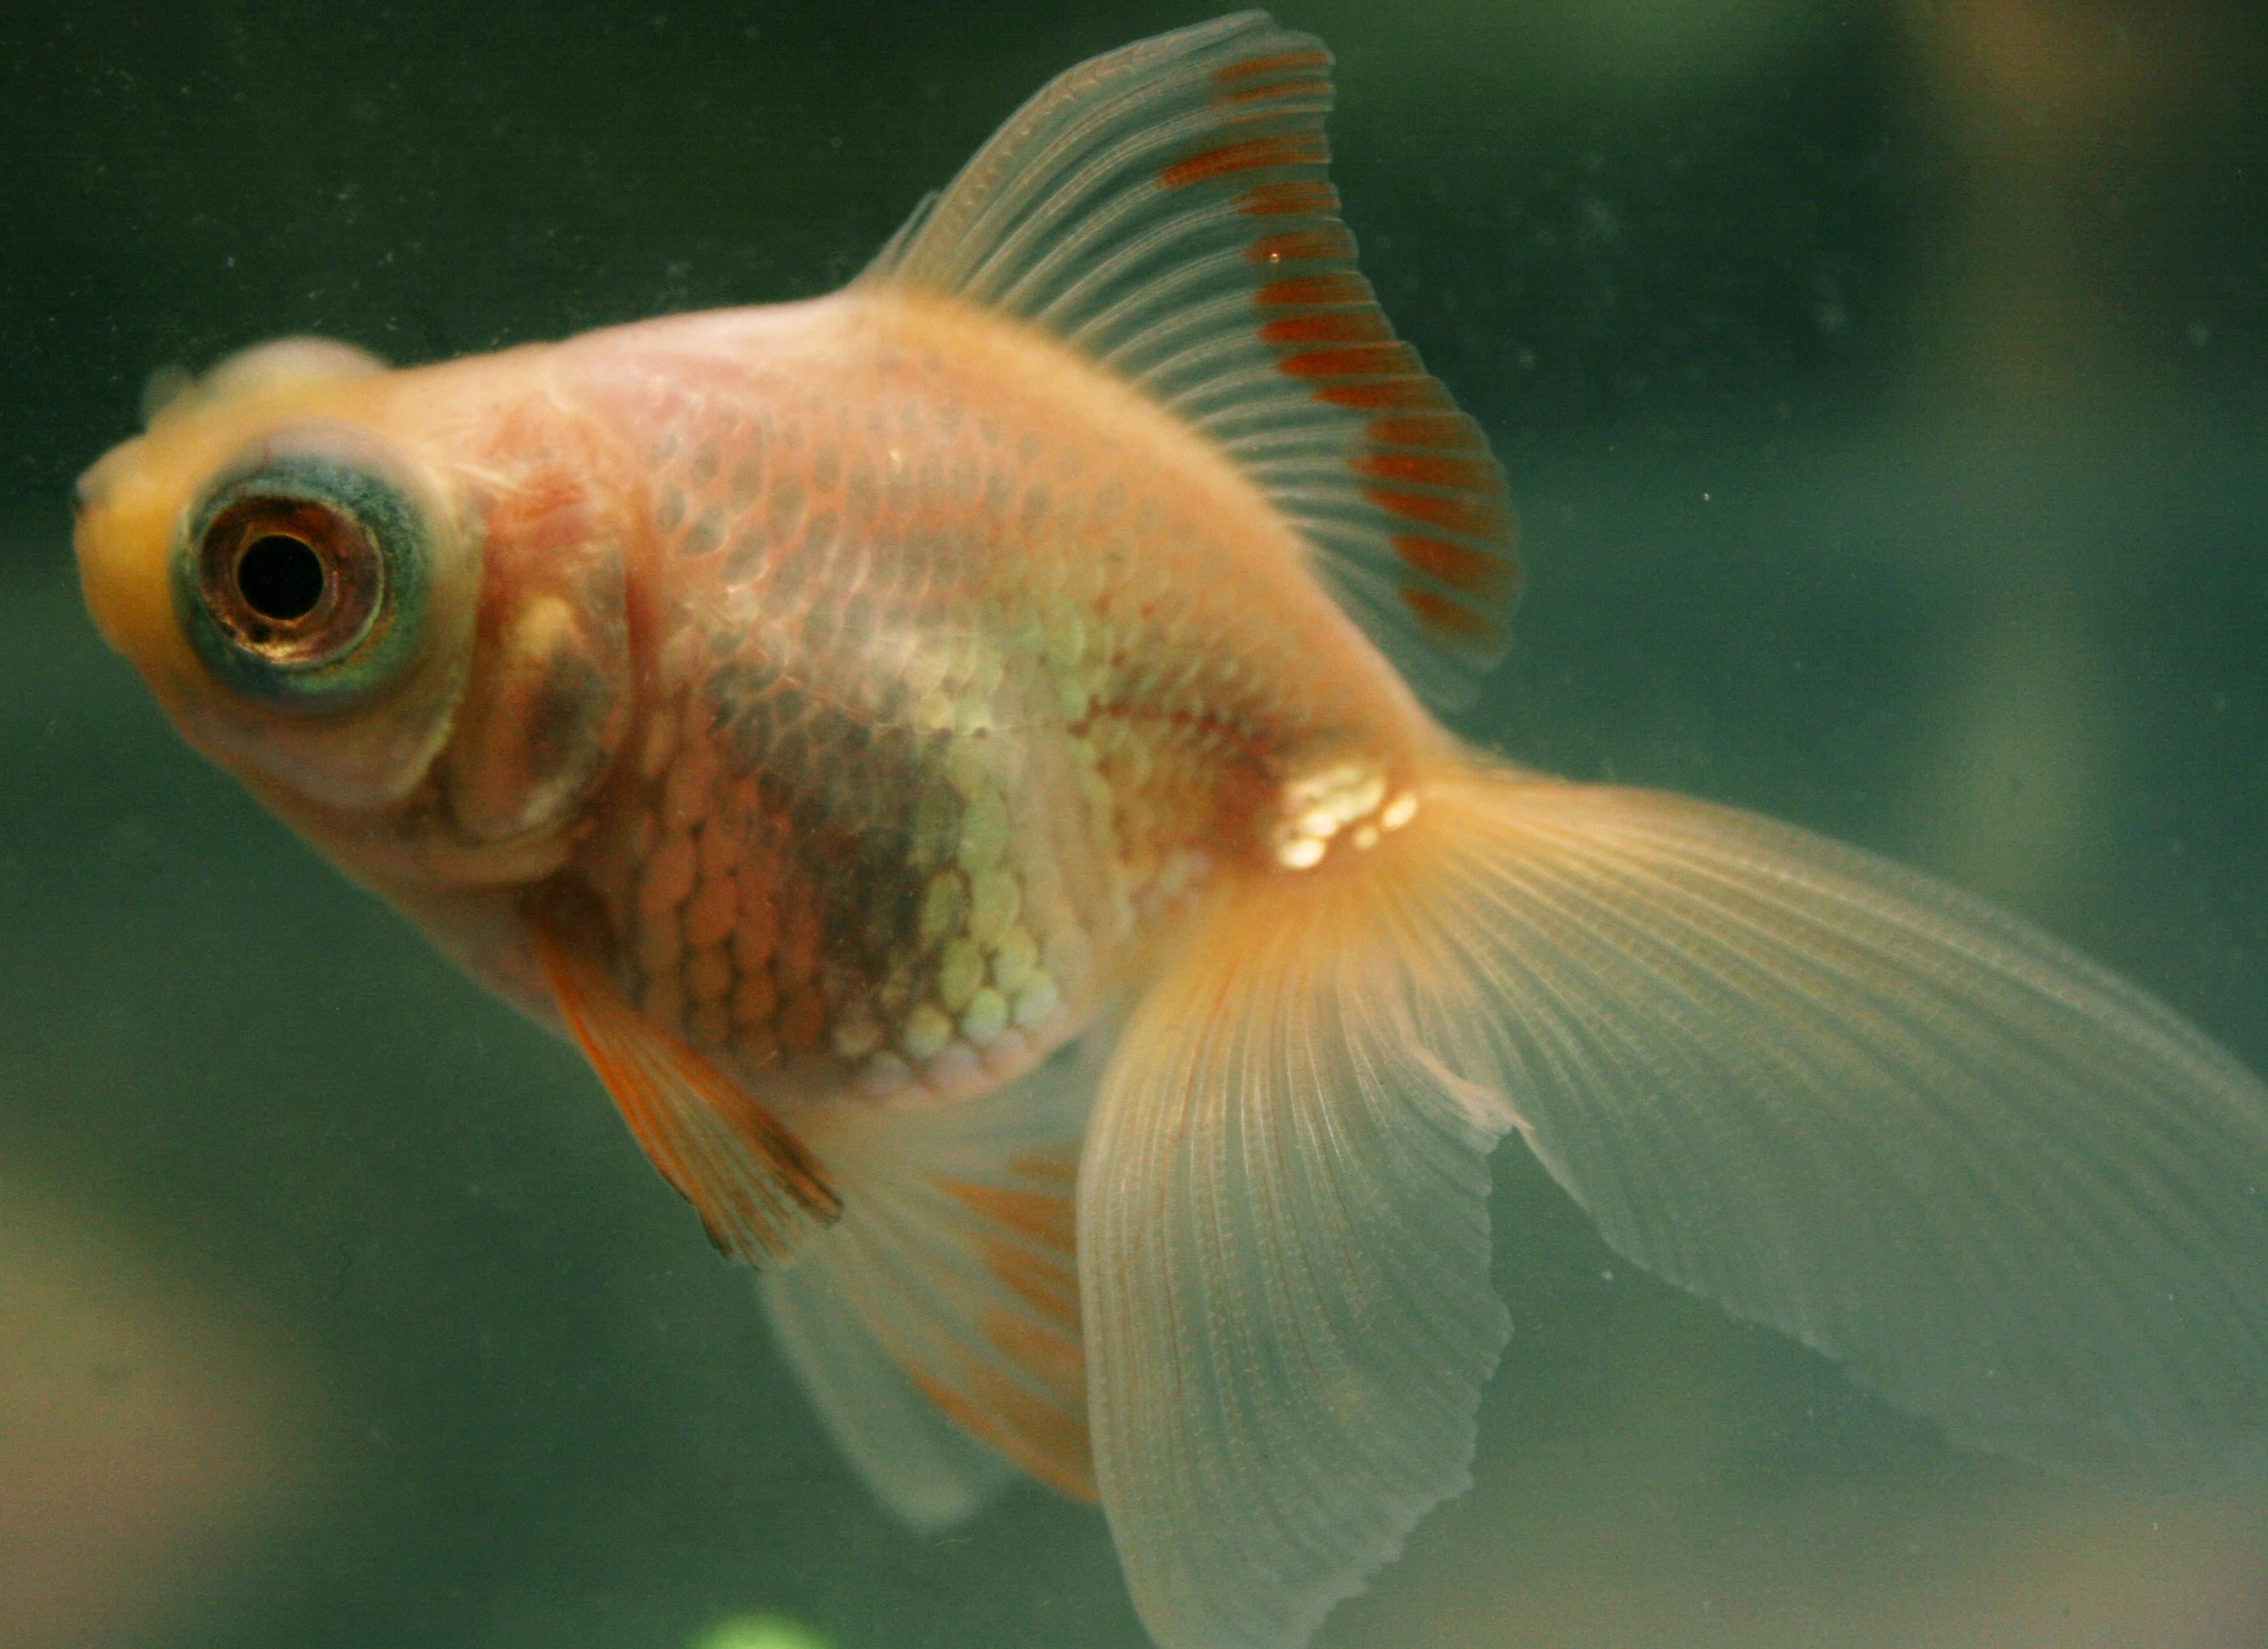 Stupid-Looking Goldfish